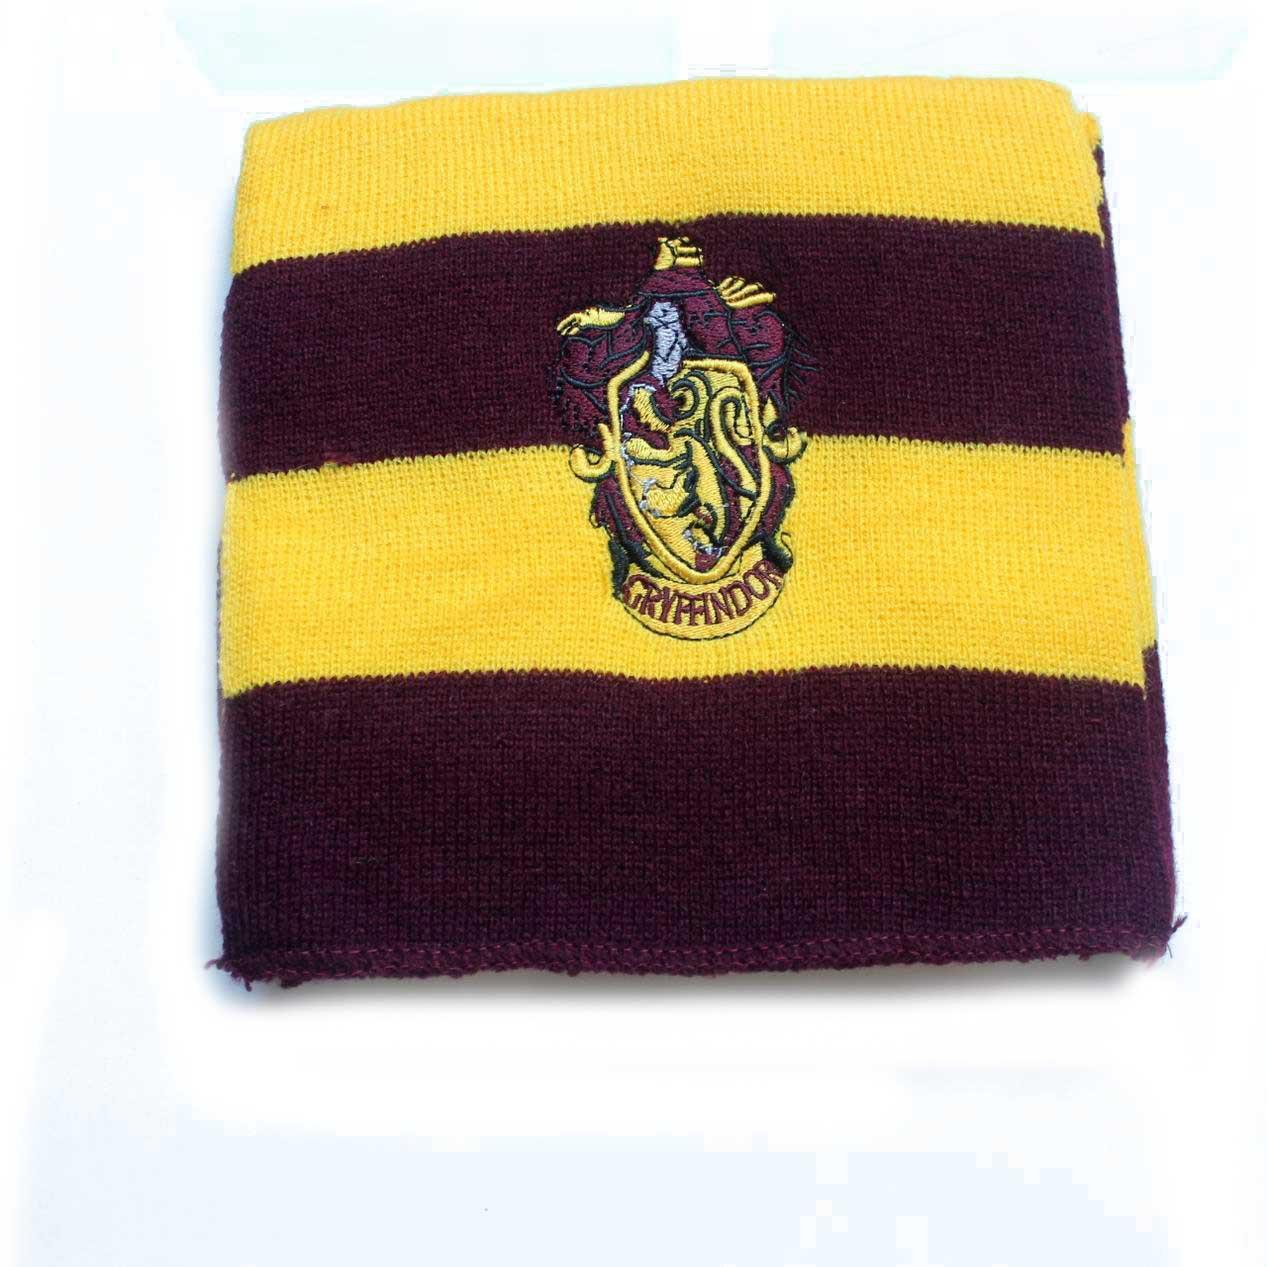 Harry Potter Schal Strickschal Gryffindor Slytherin Hufflepuff Ravenclaw Kostüm